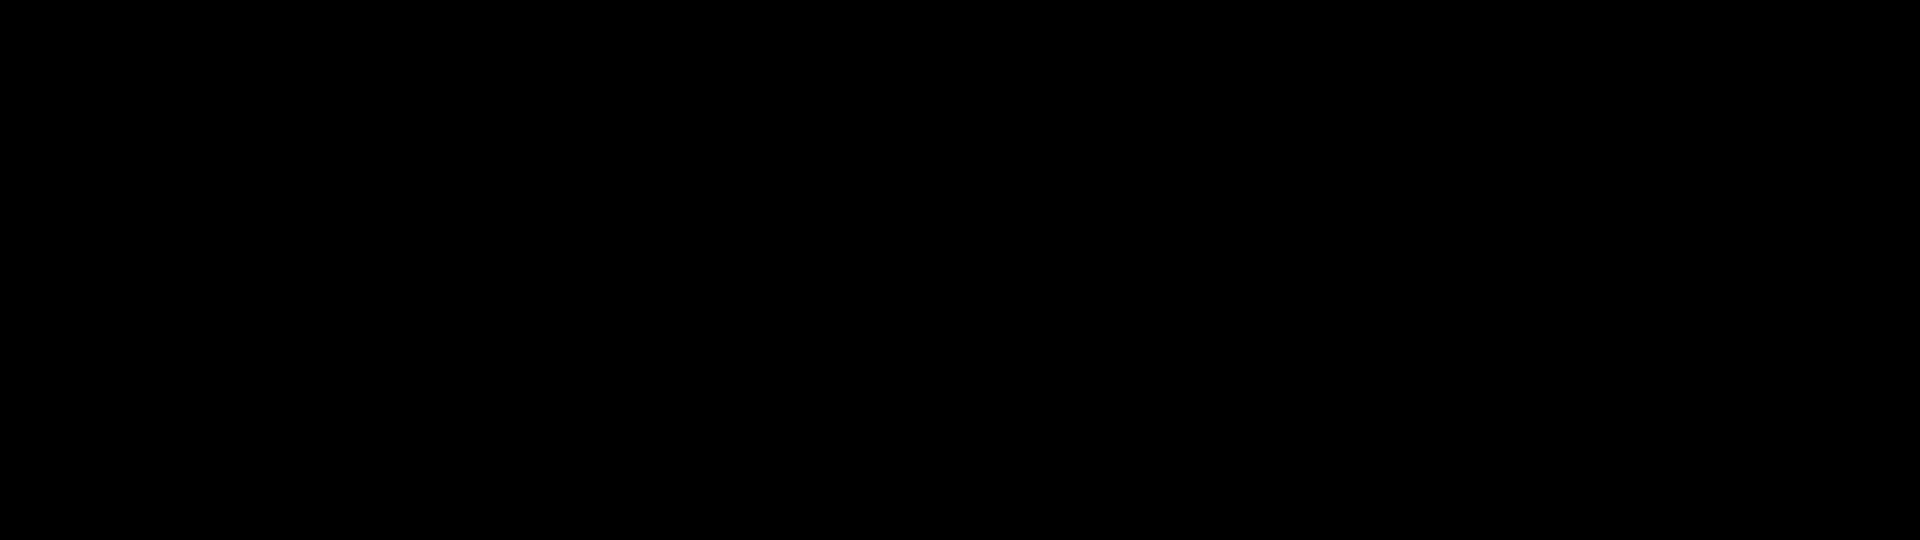 Pagseguro Isolar